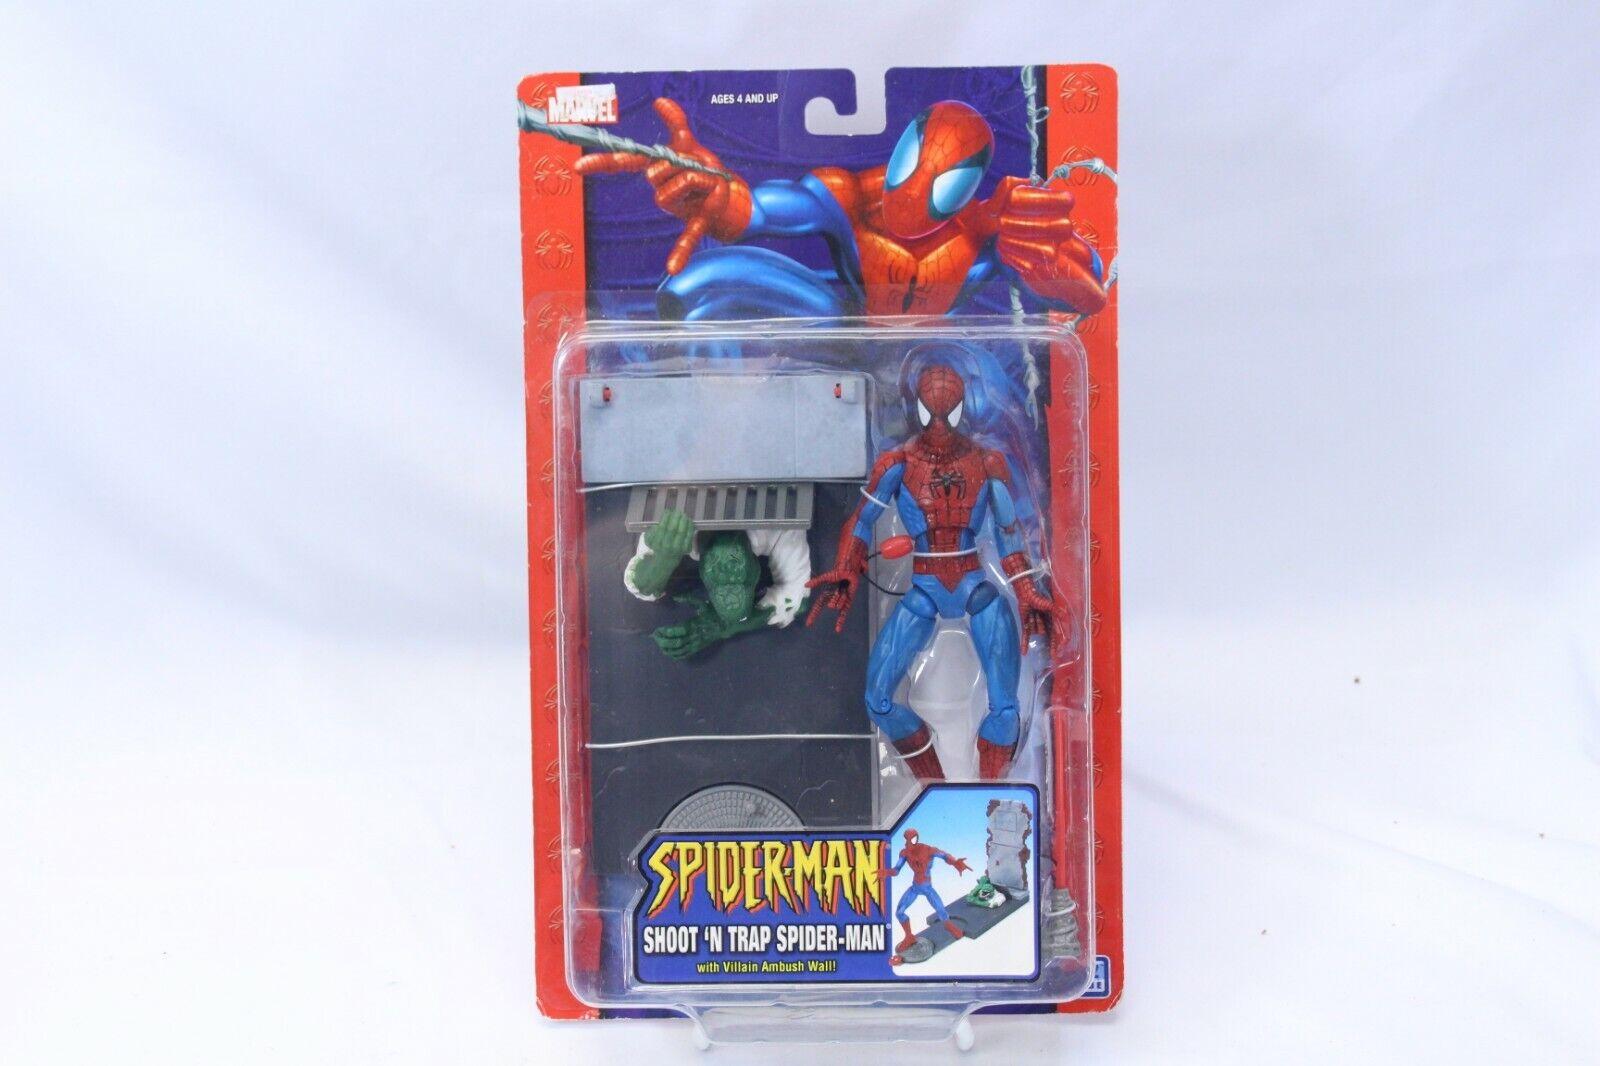 2004 Marvel Spiderman Shoot 'N Trap Spiderman Villain Ambush Wall